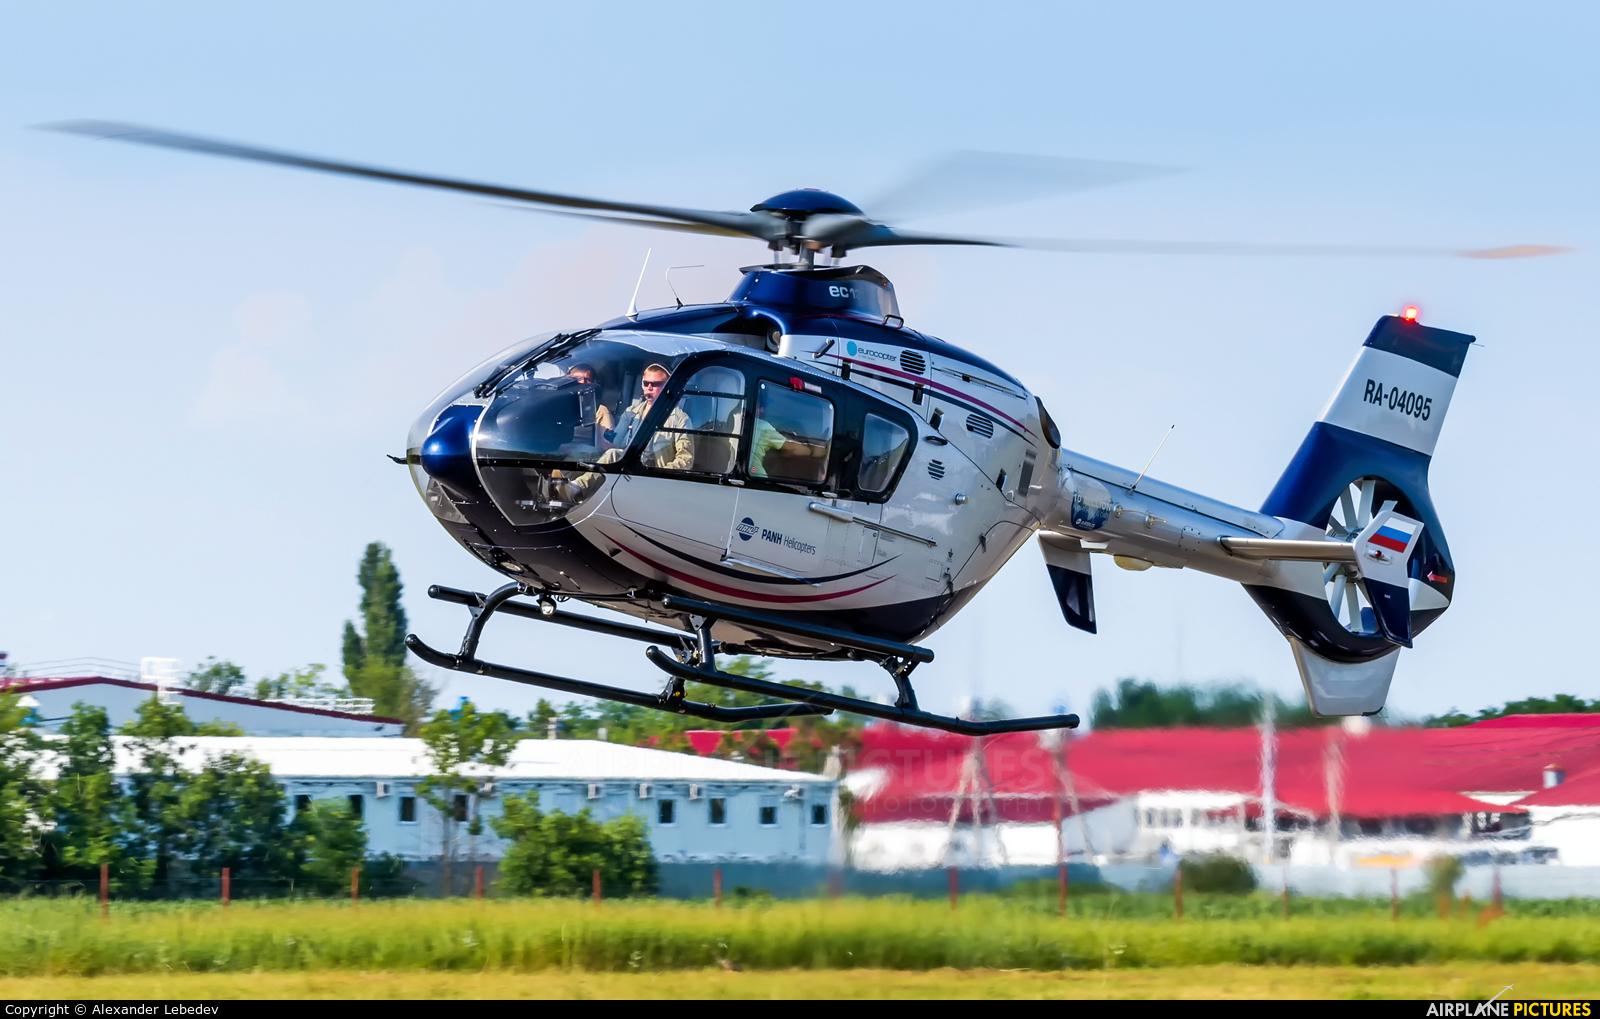 PANH Helicopters RA-04095 aircraft at Novotitarovskaya-Azimut